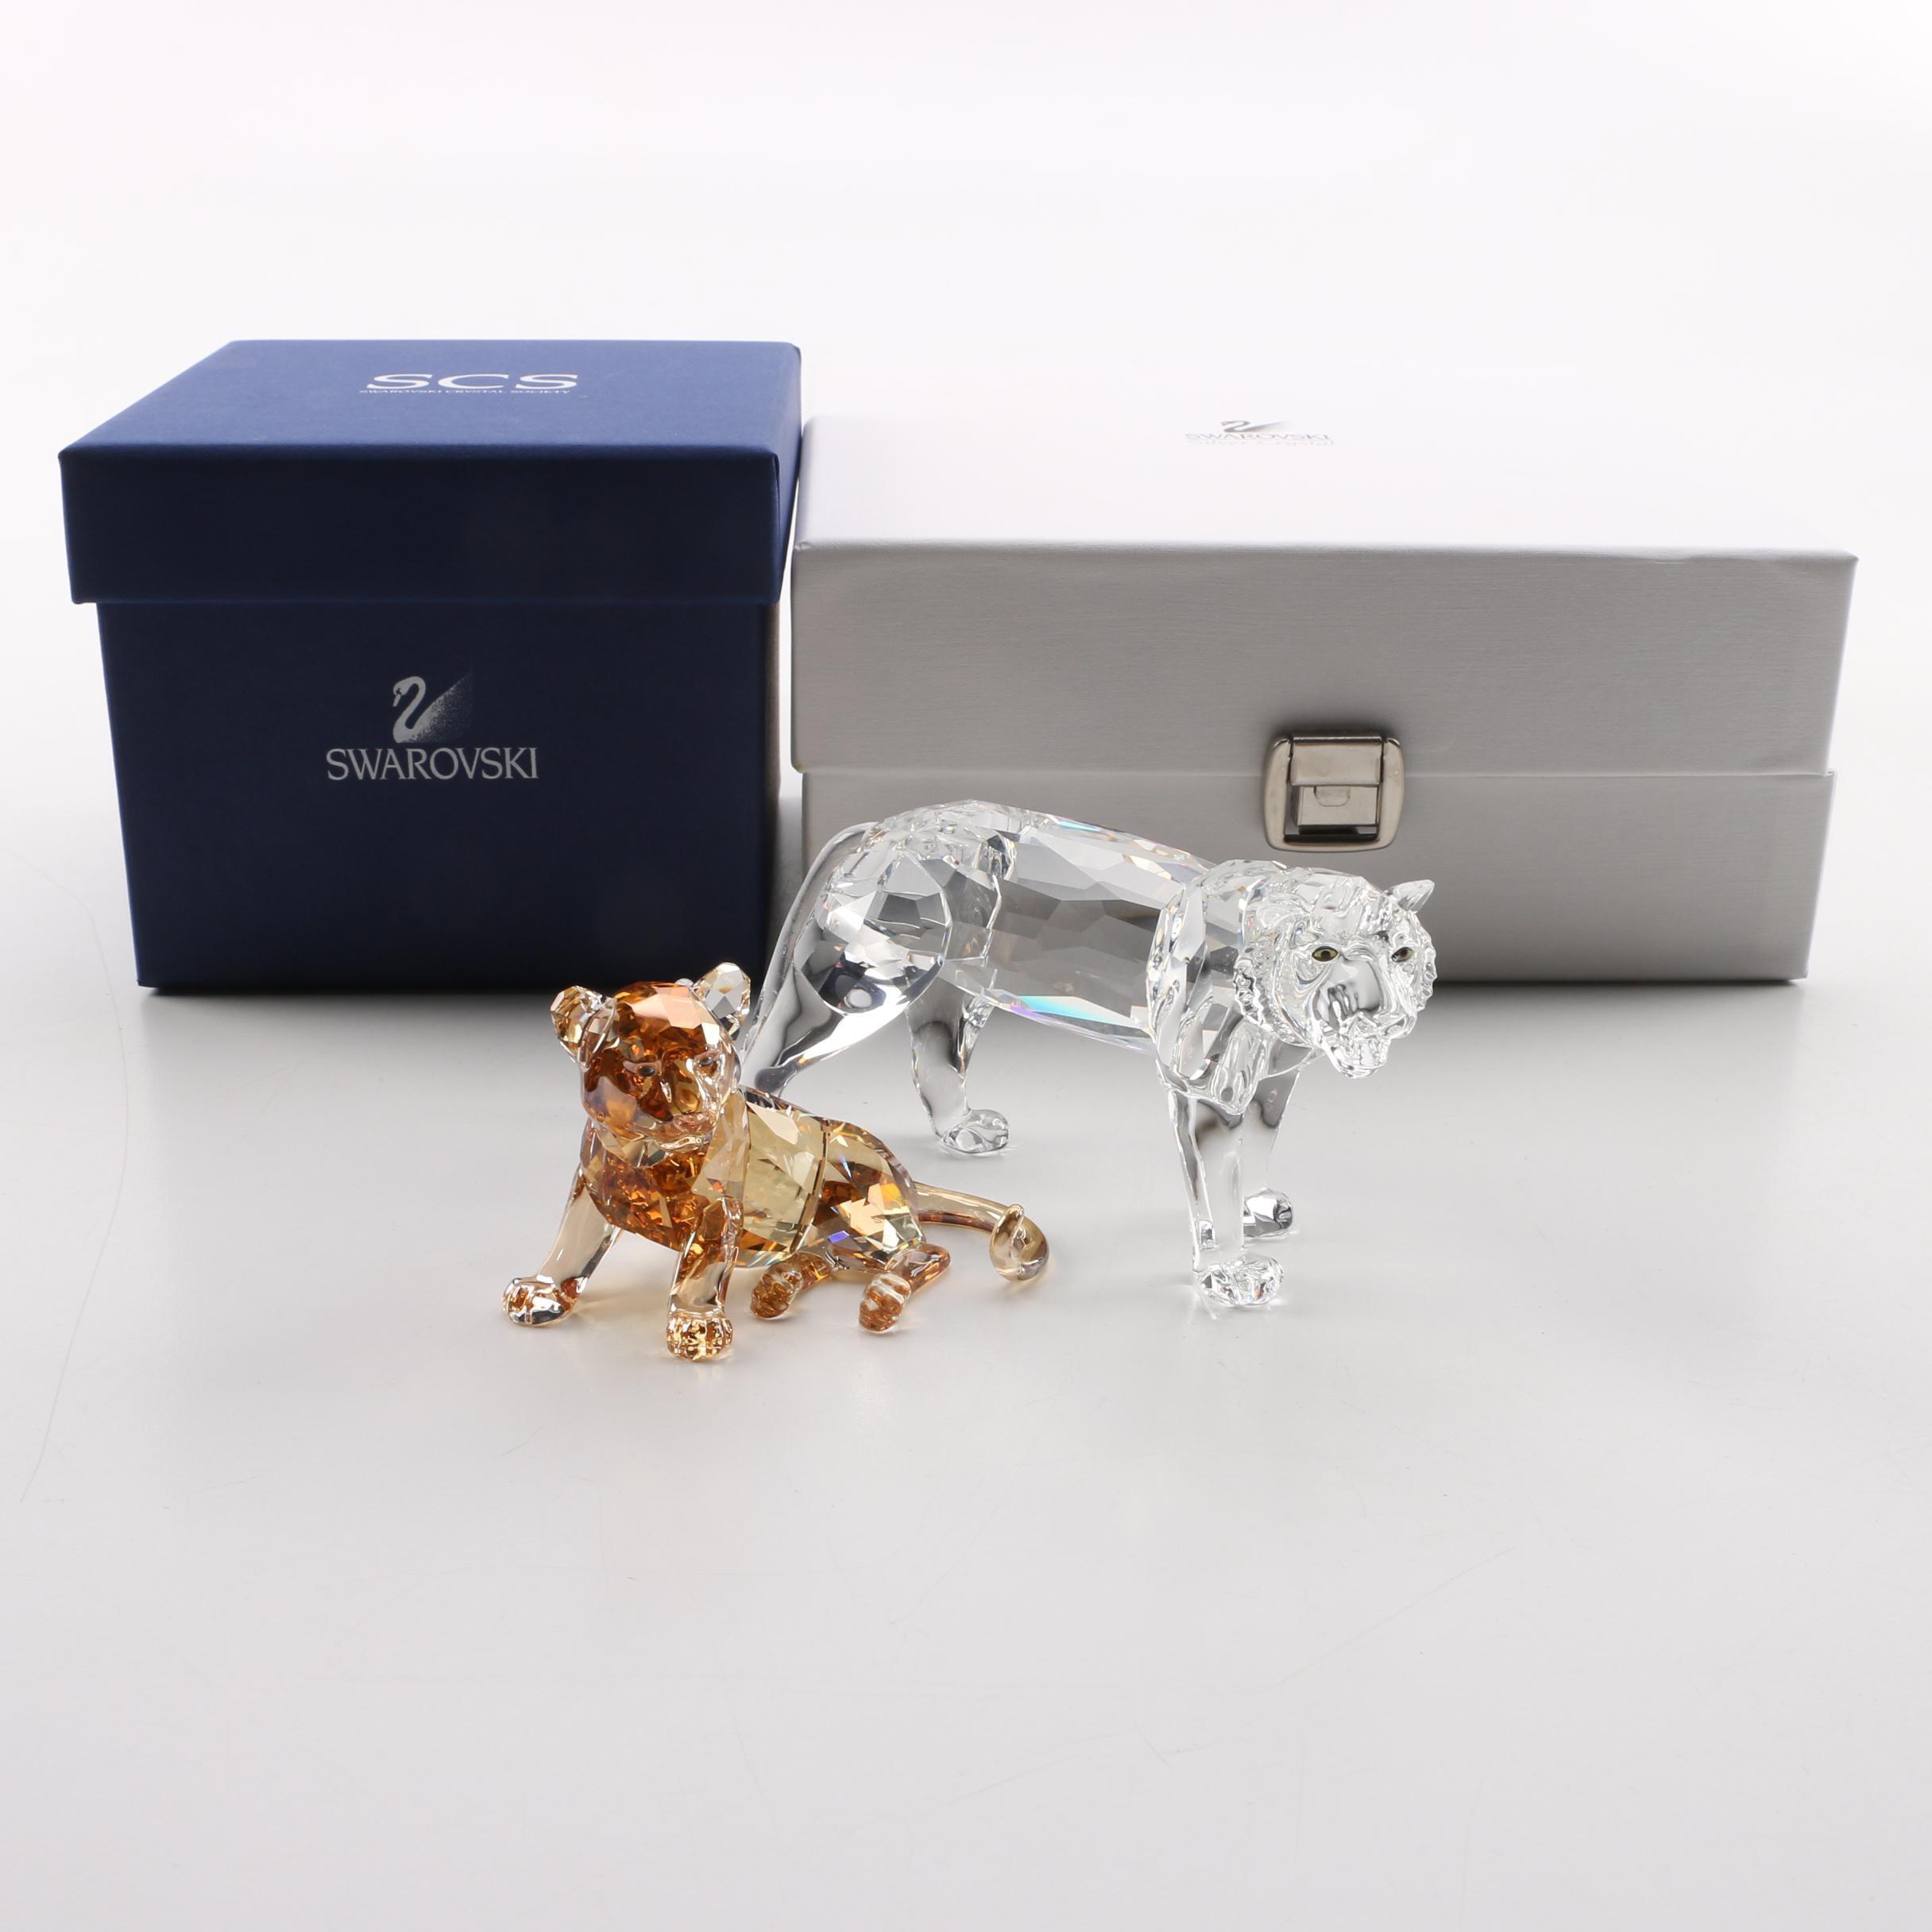 Swarovski Crystal Tiger and Cub Figurines